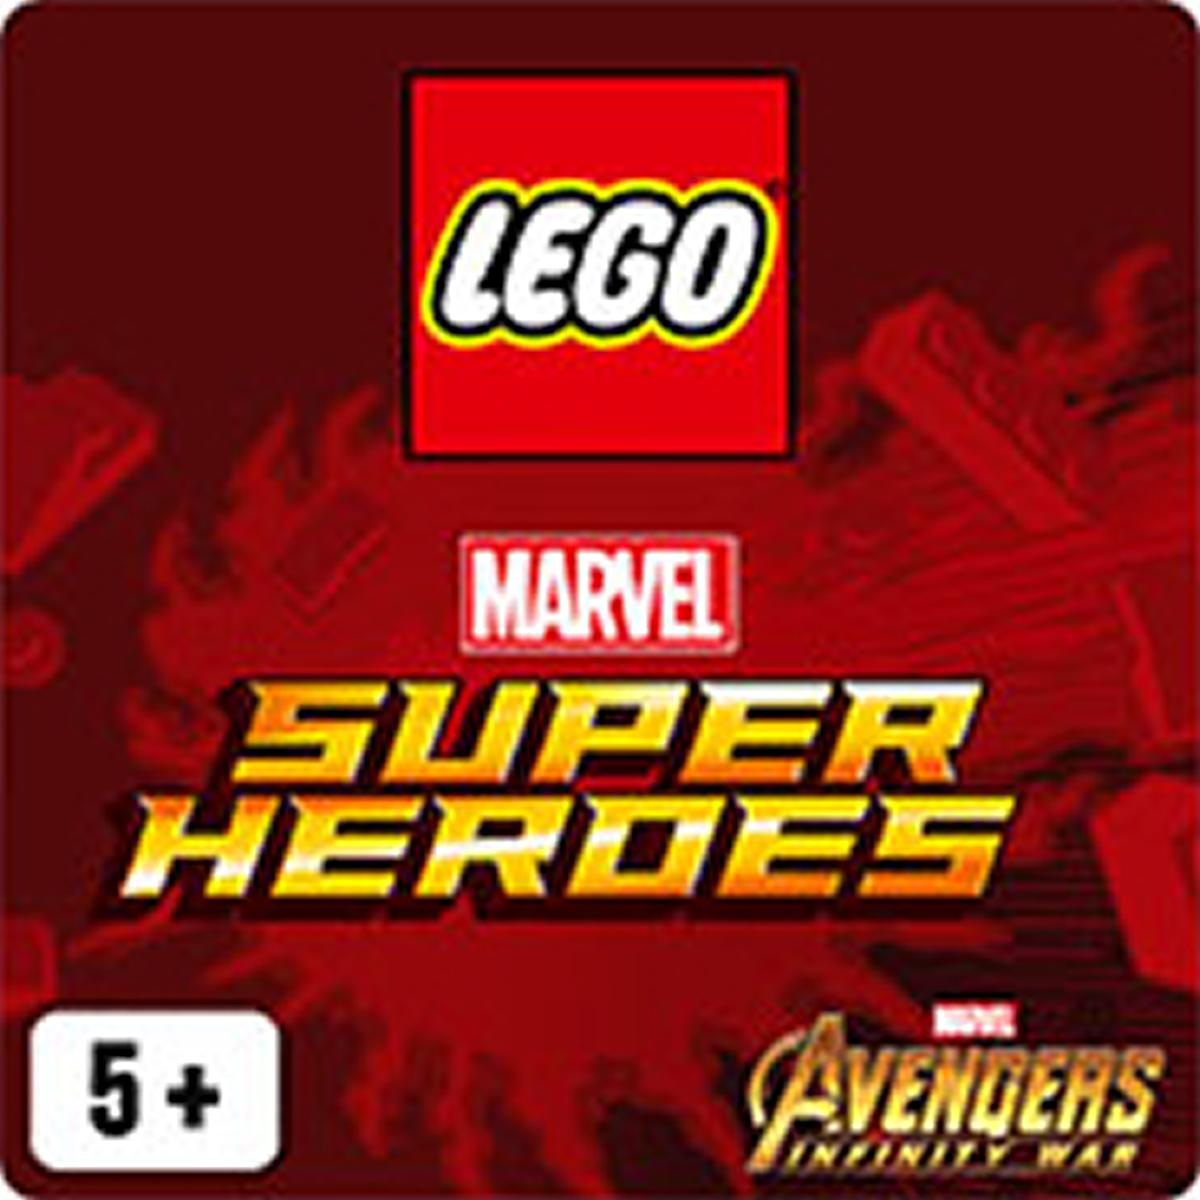 Lego, Marvel, Super Heroes